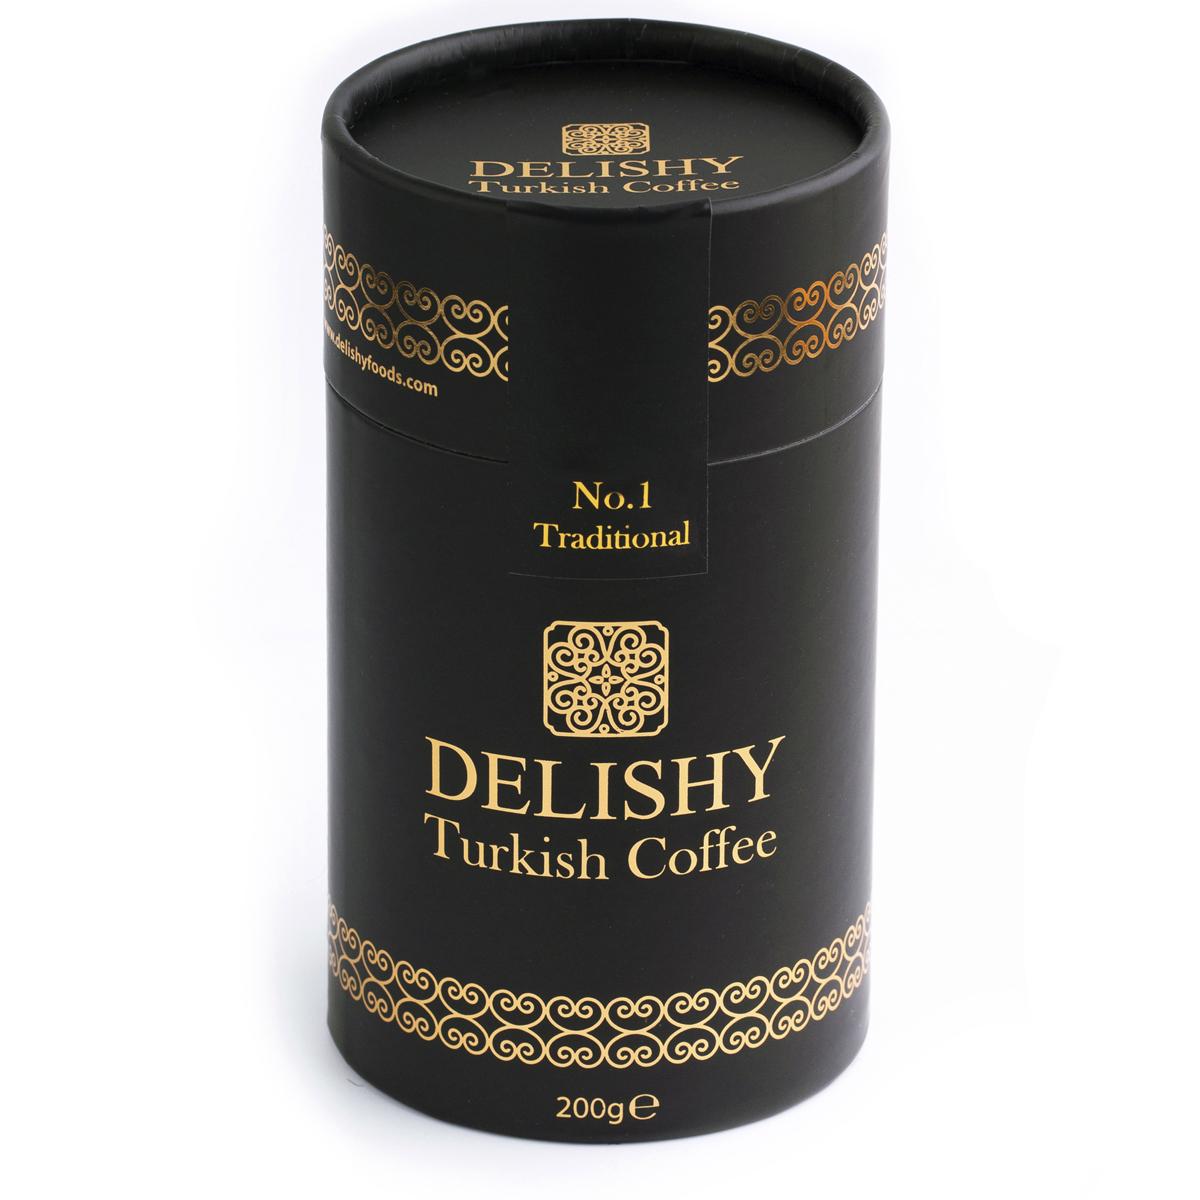 Delishy No.1 Traditional Turkish Coffee (200gr)